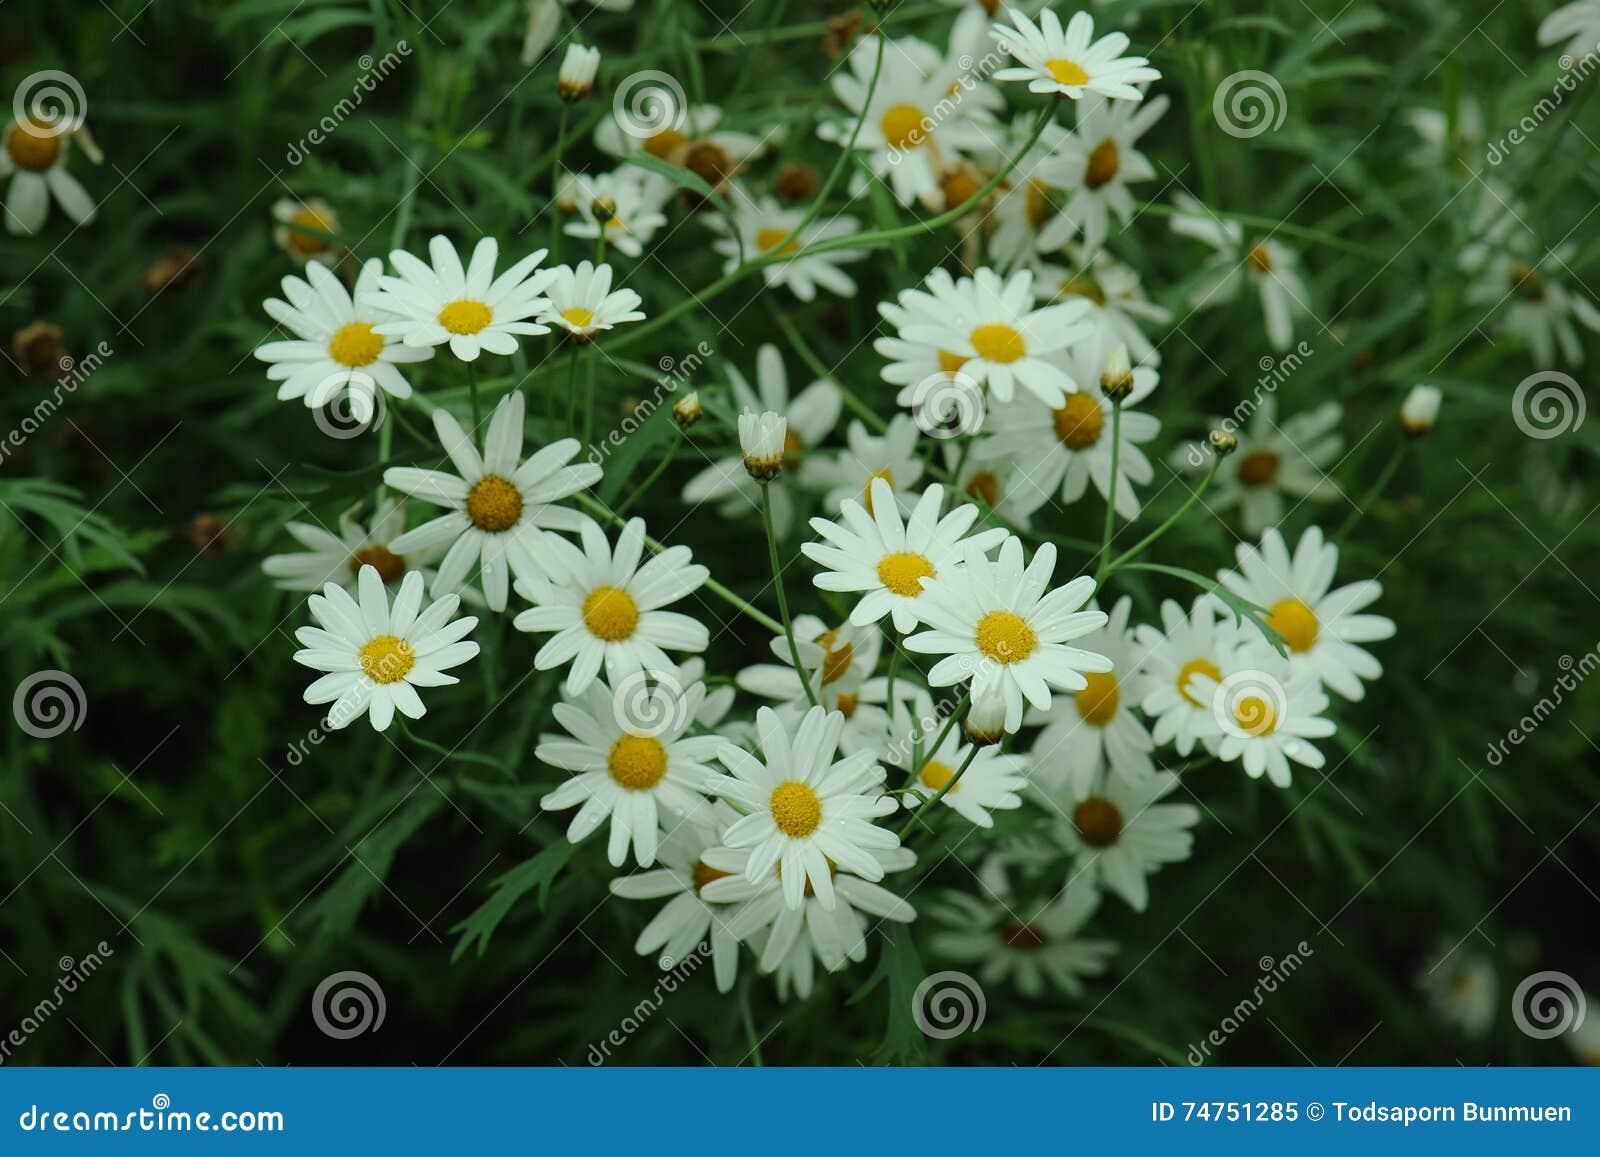 Daisy white flower in garden mild soft stock image image of daisy white flower in garden mild soft izmirmasajfo